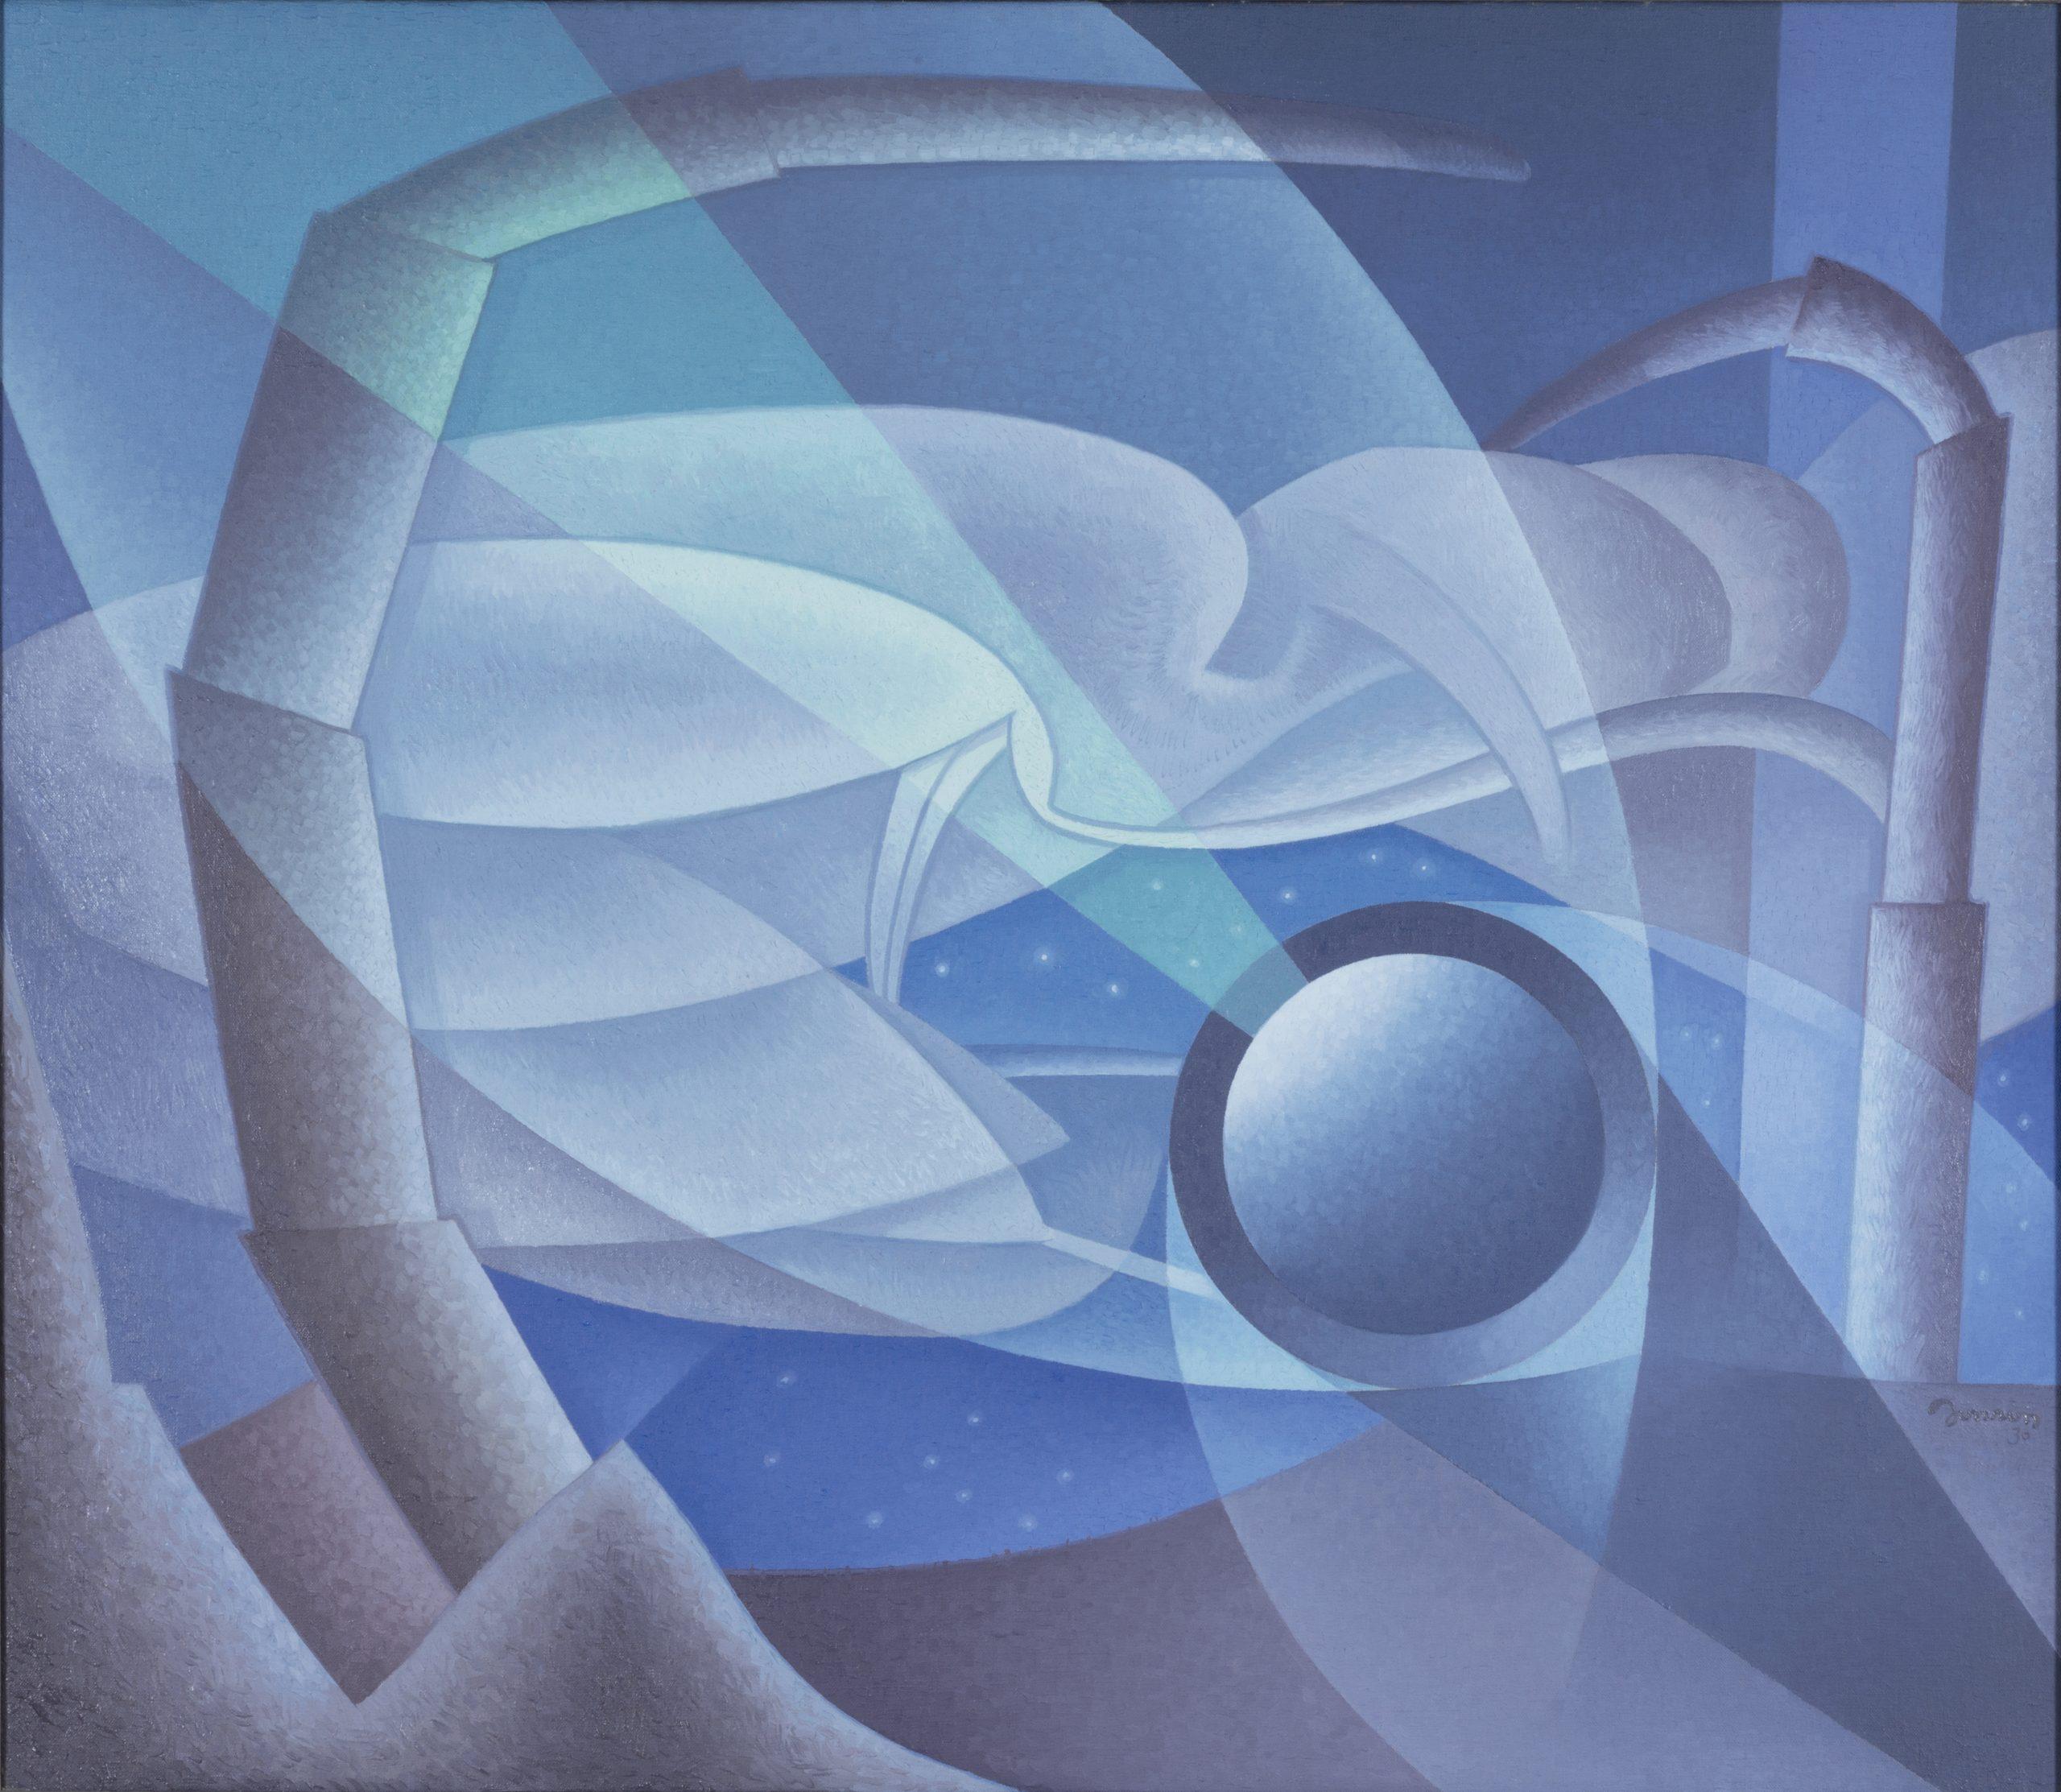 Time Cycle (Night), 1930, Oil on canvas, Bequest of Raymond Jonson, Raymond Jonson Collection